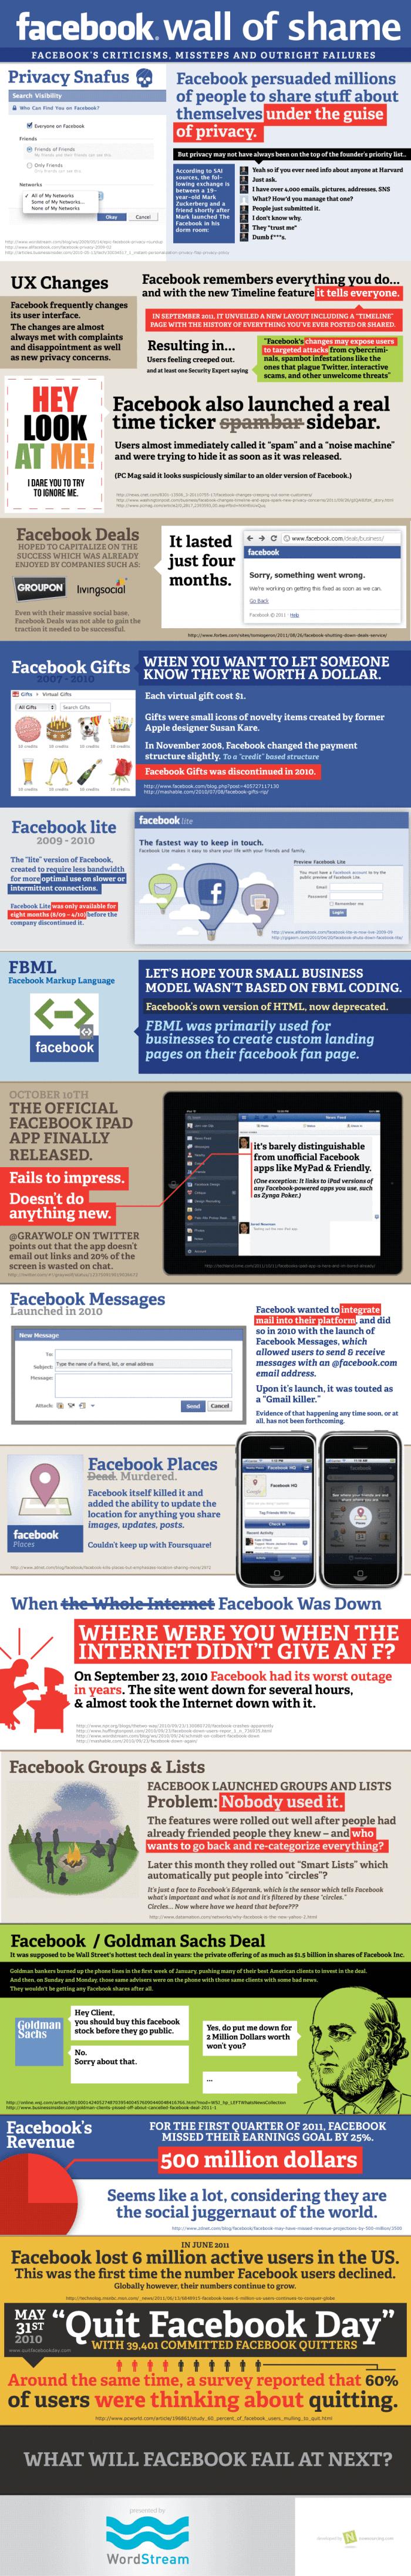 Facebook wall of shame